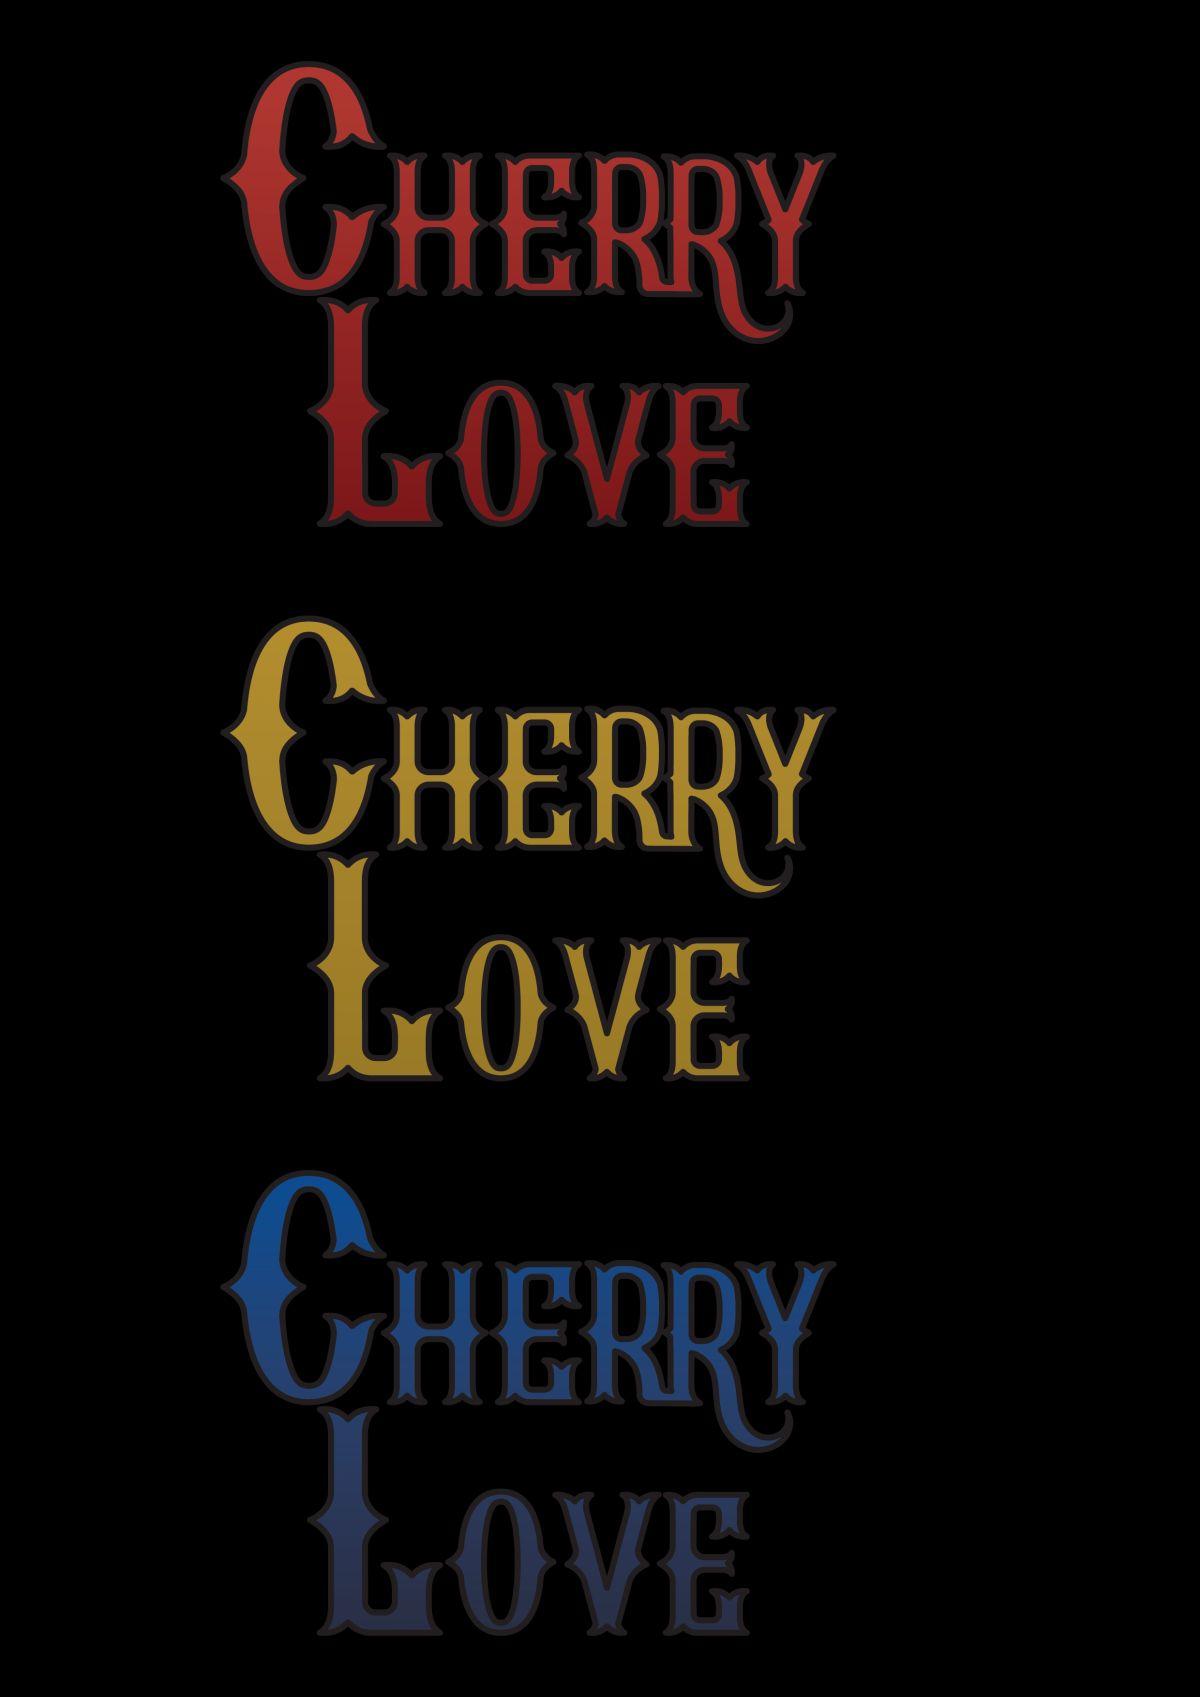 @cherrylove